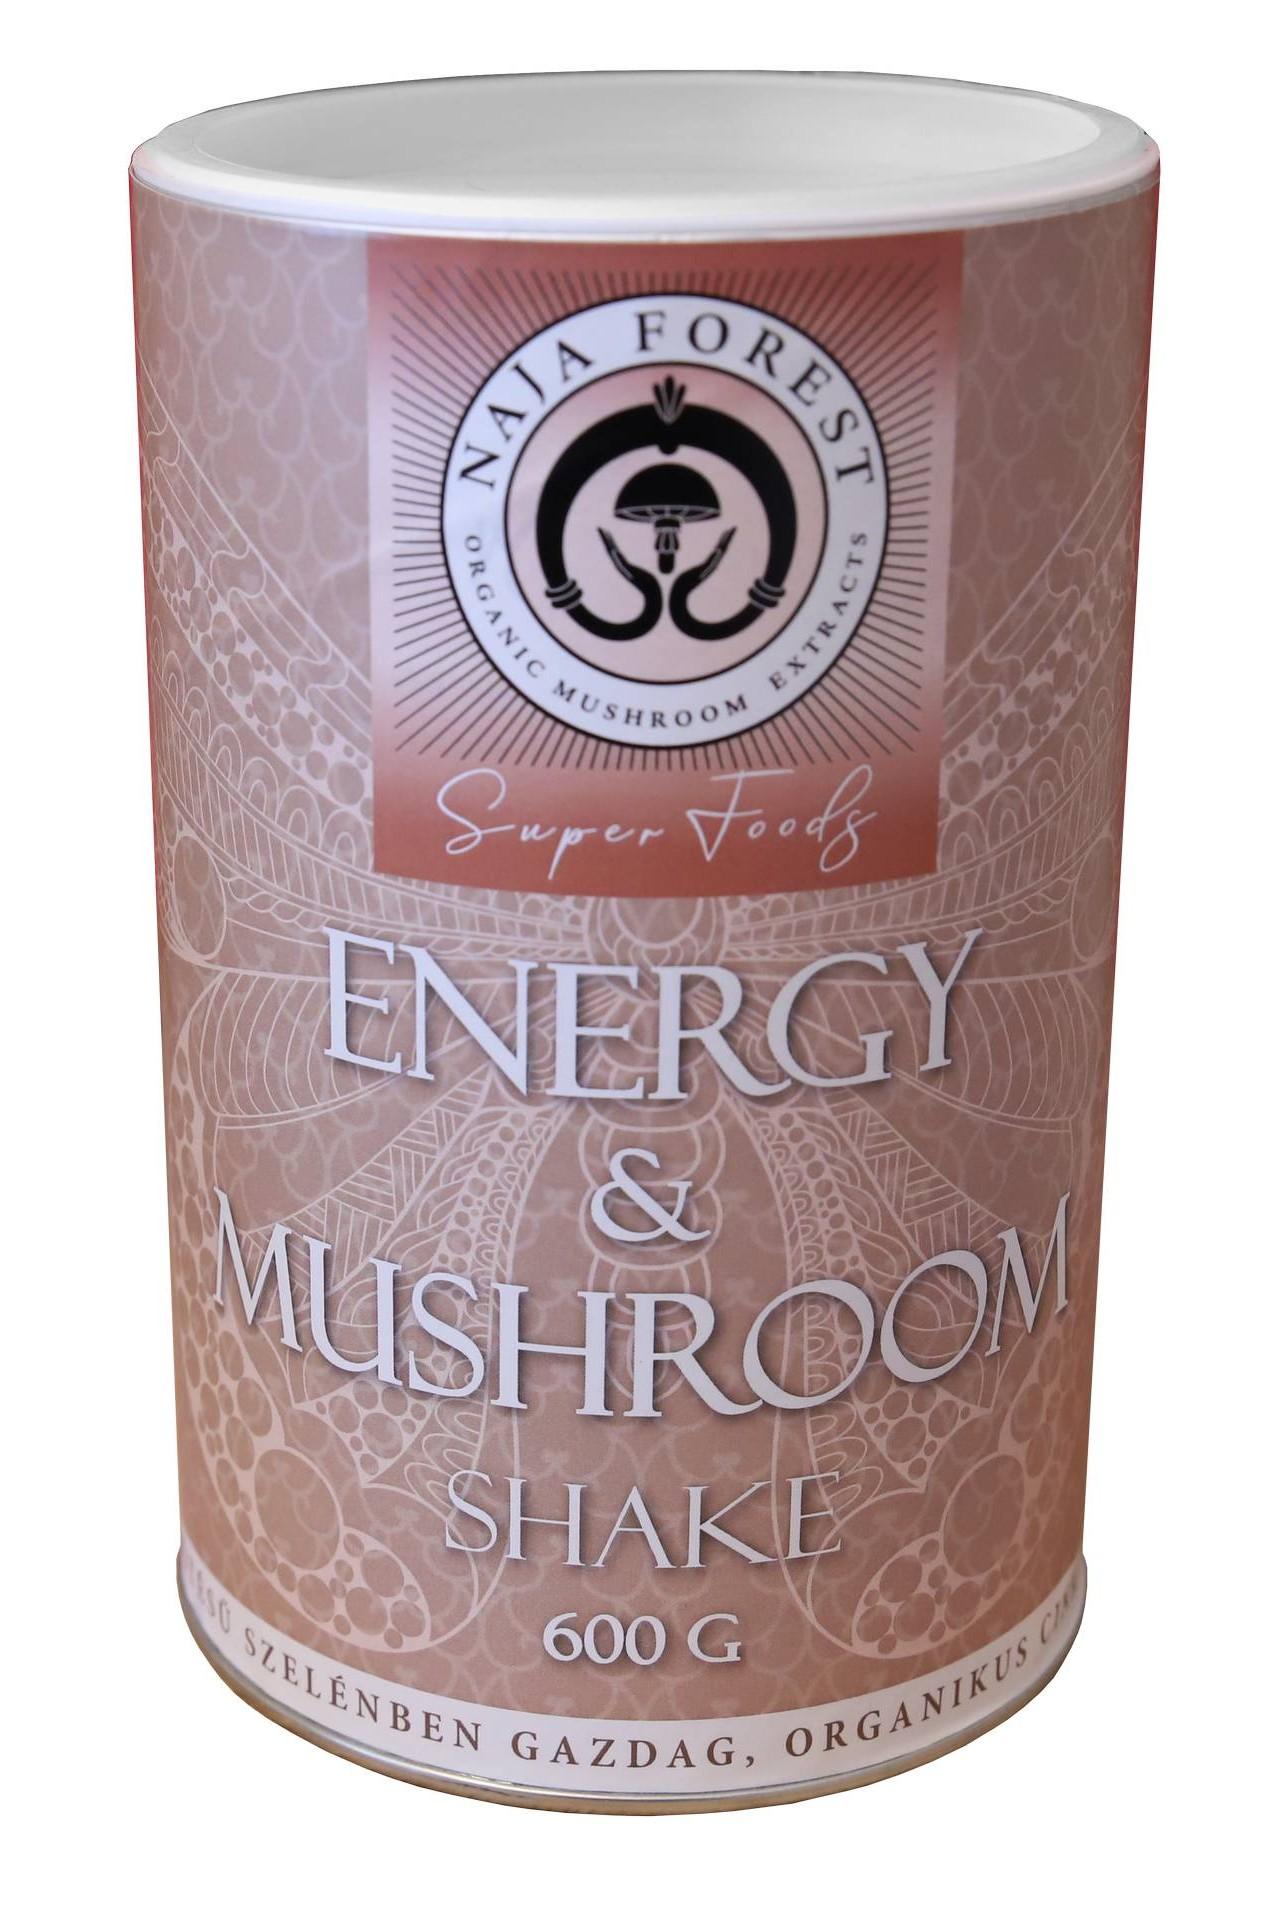 EnergyMushroom Shake